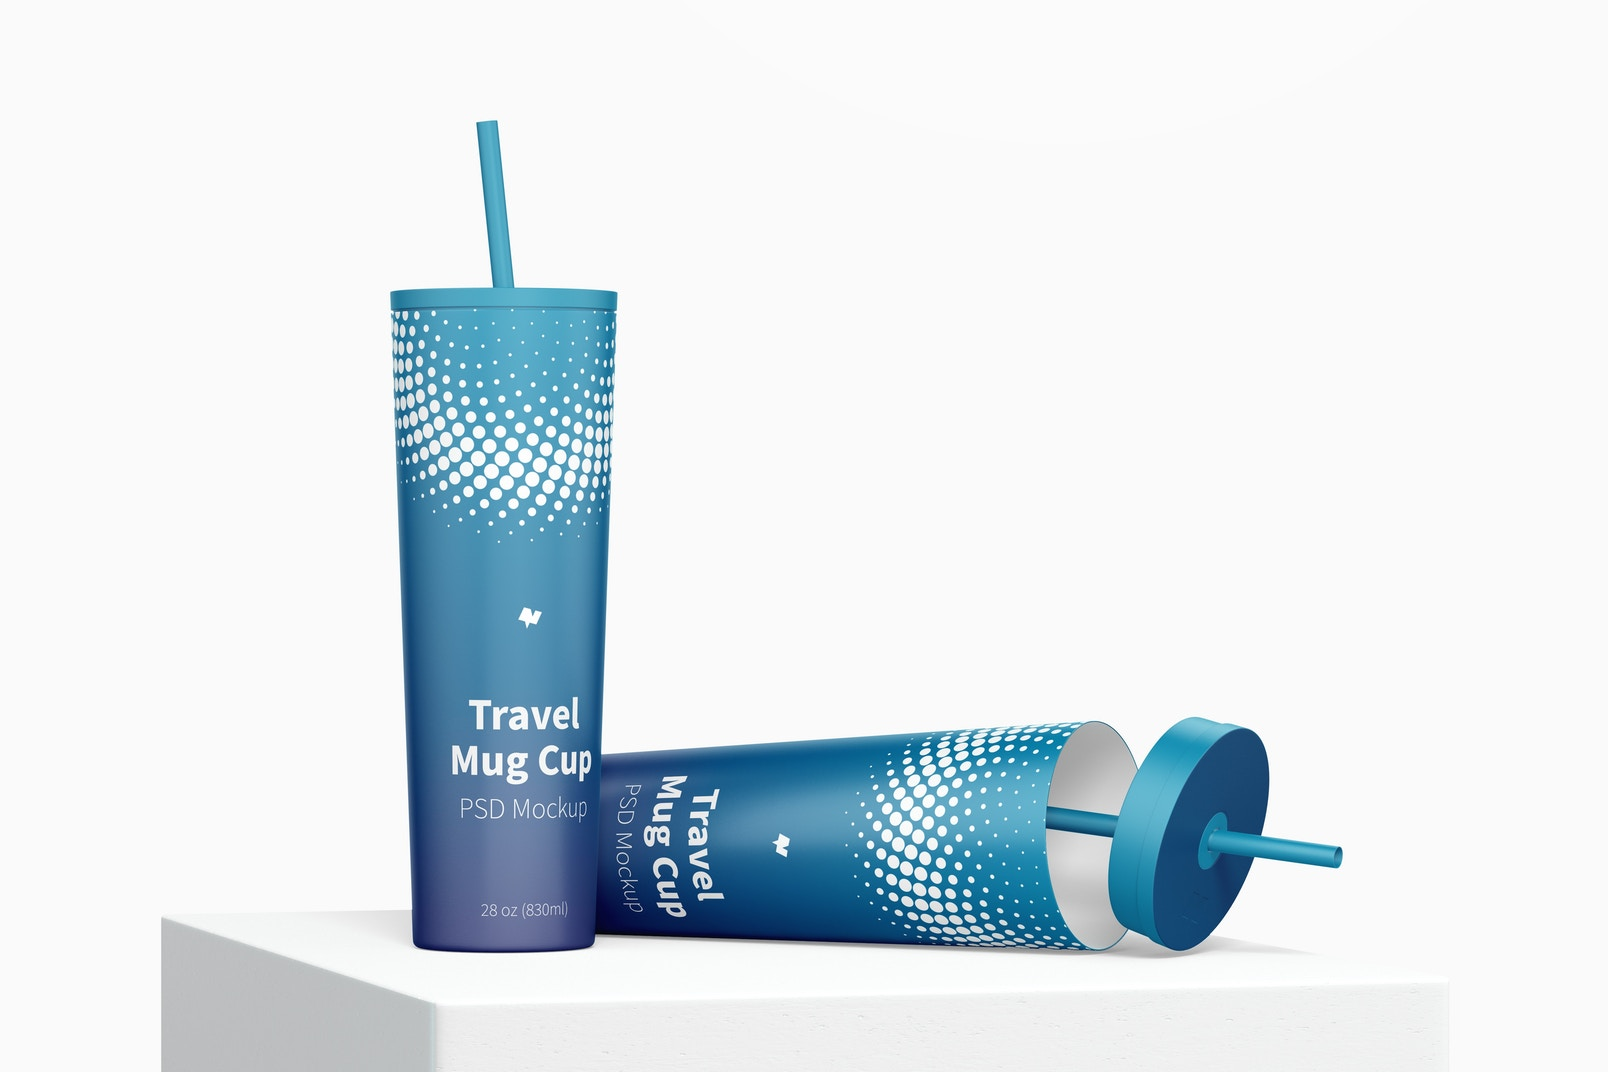 Travel Mug Cups Mockup, Dropped